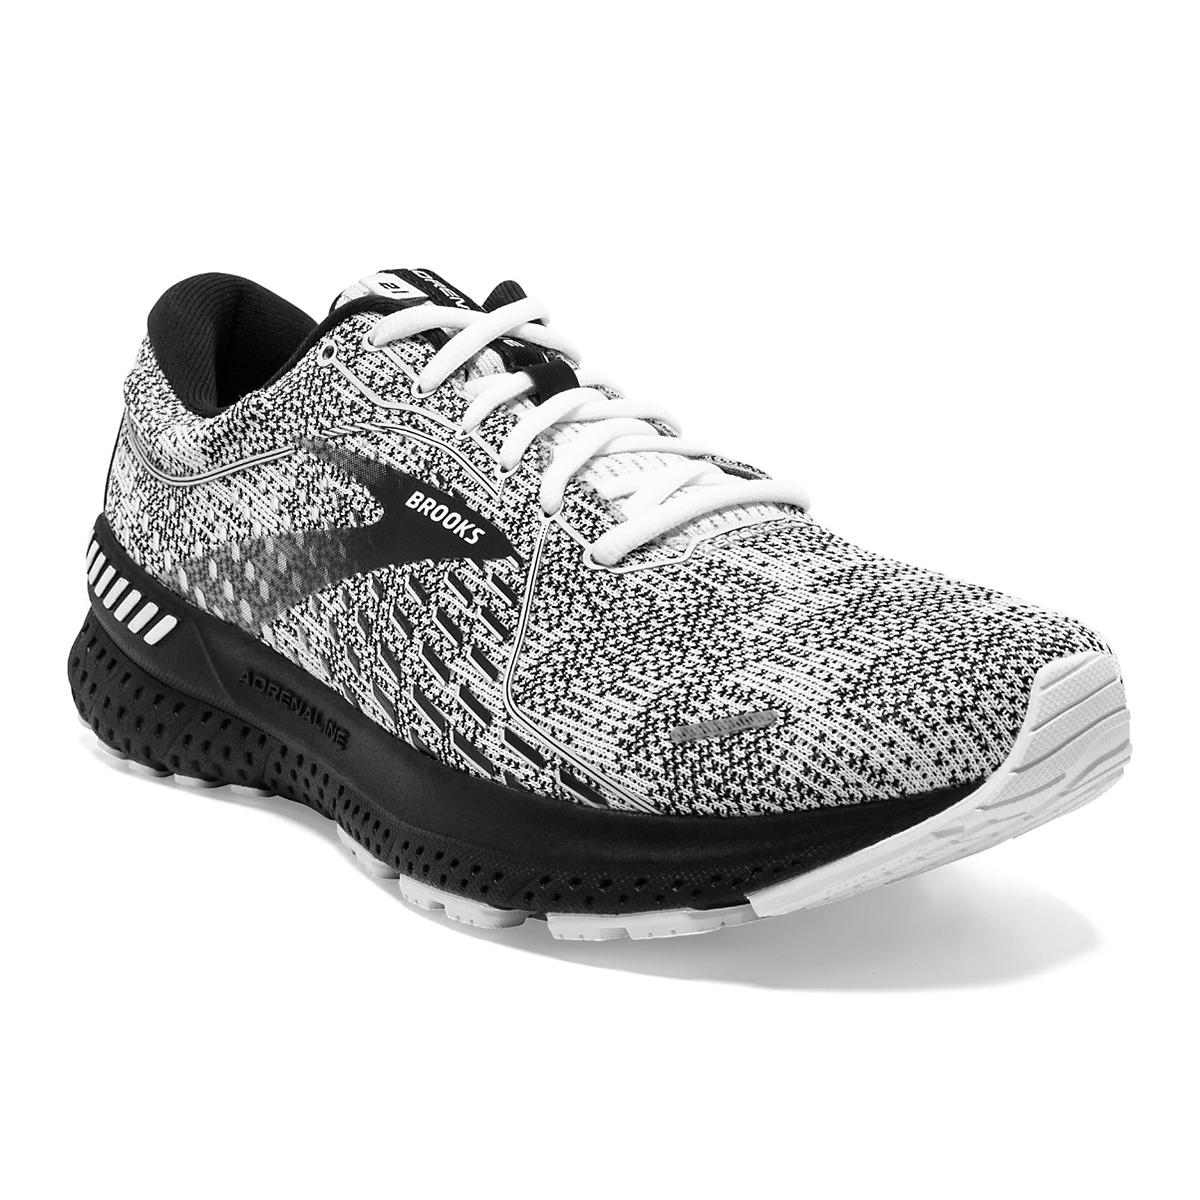 Women's Brooks Adrenaline GTS 21 Running Shoe - Color: White/Grey/Black - Size: 7.5 - Width: Regular, White/Grey/Black, large, image 1